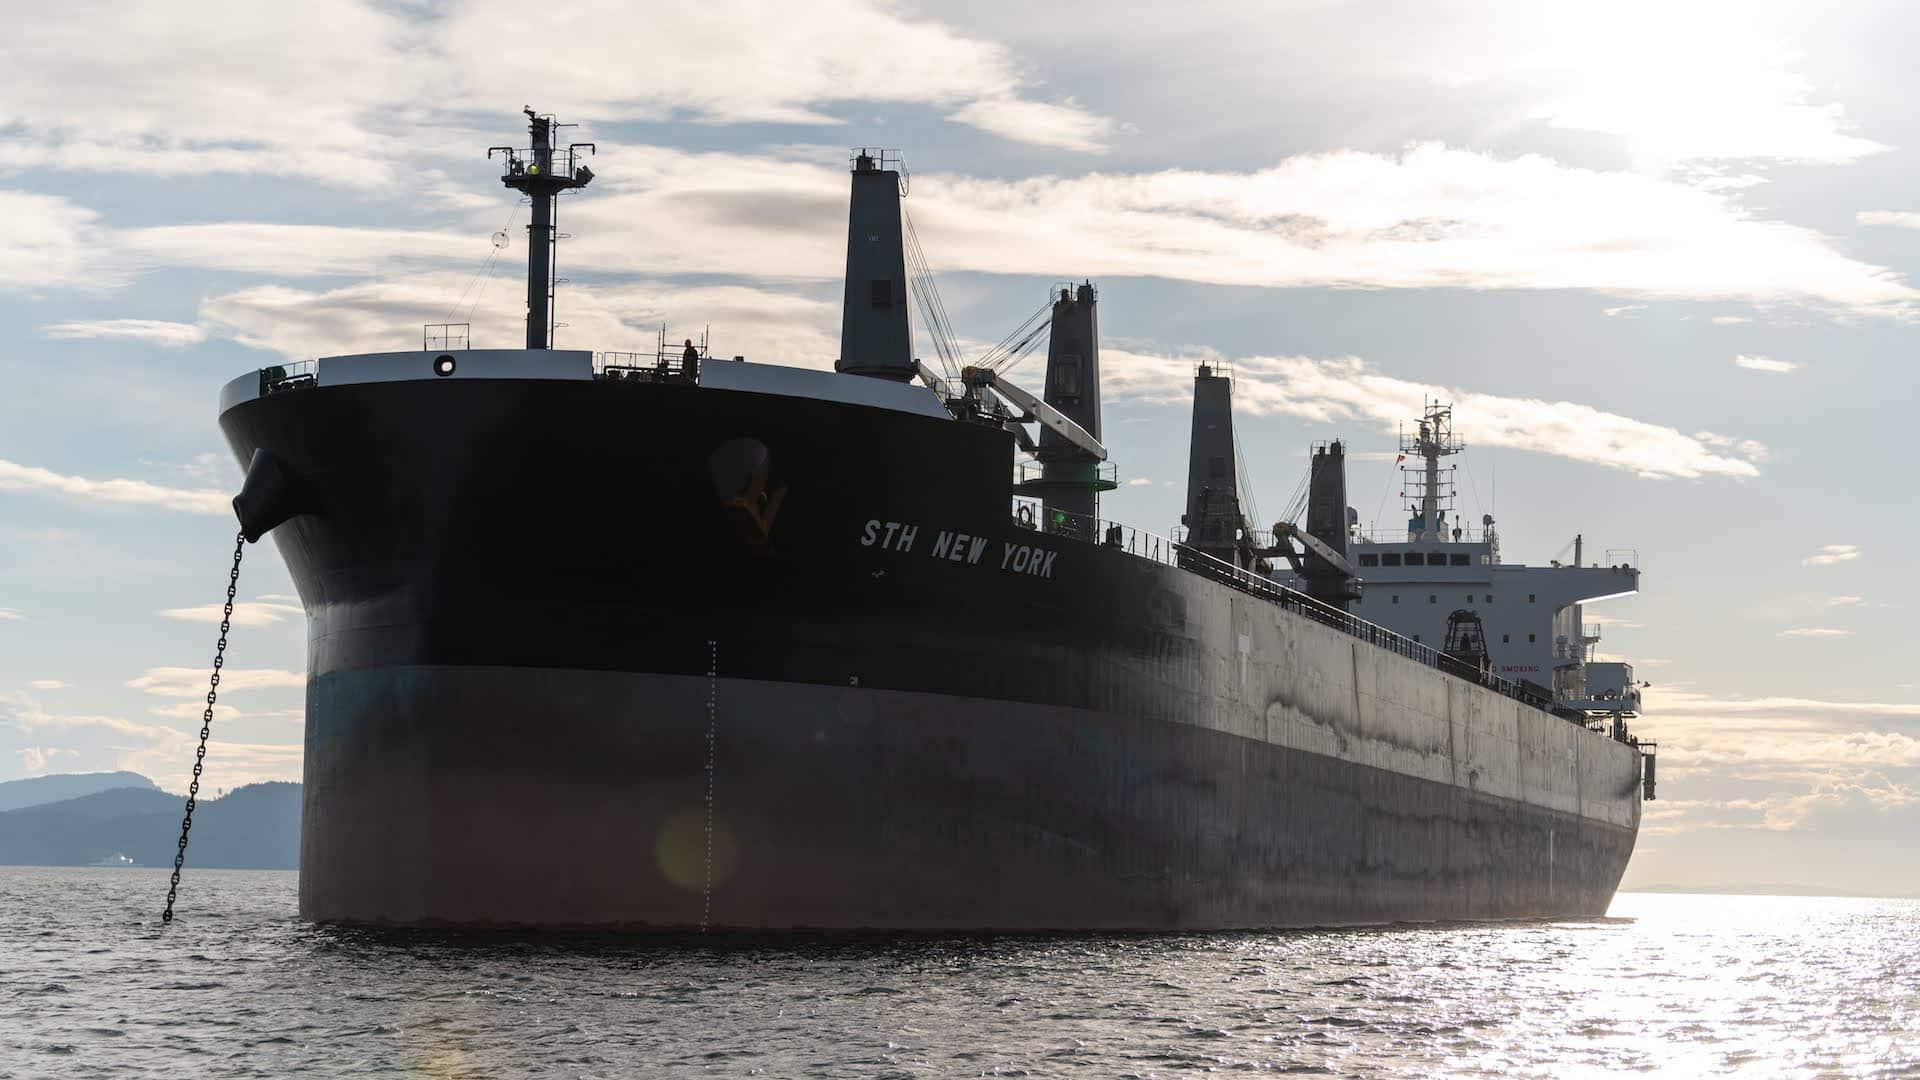 A governance solution for the Salish Sea